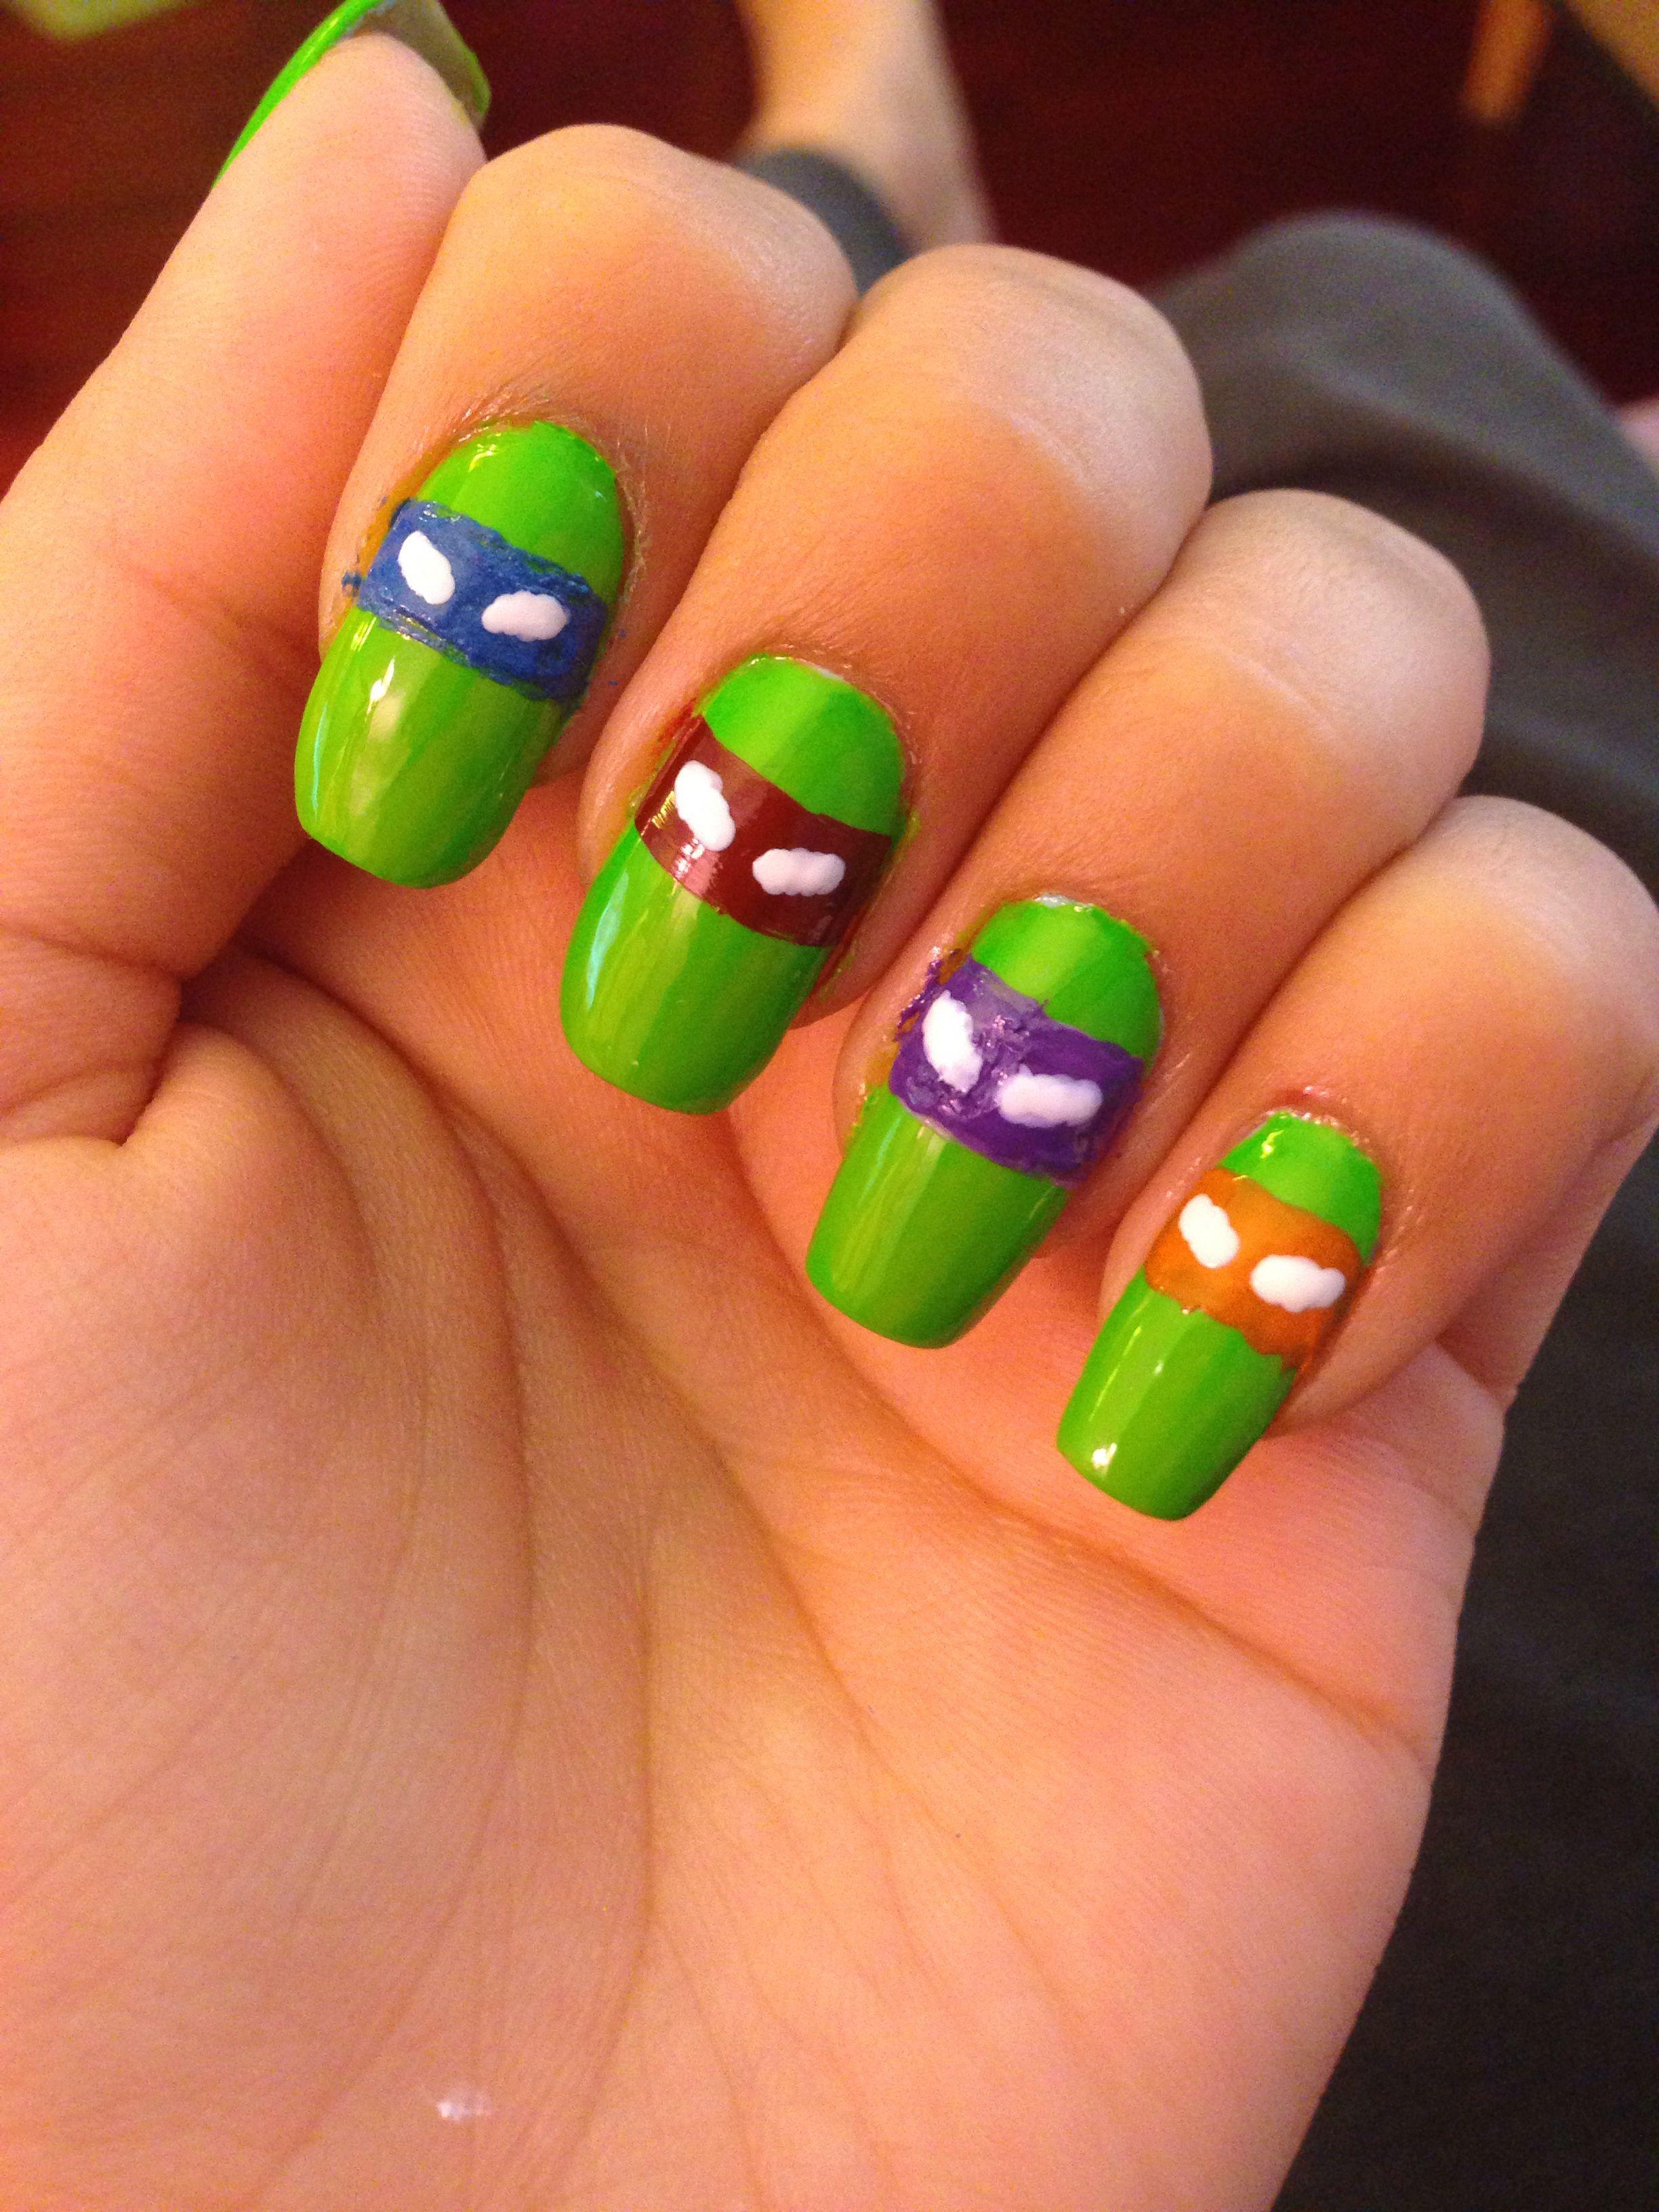 Ninja turtle nails!!!! Whaaaa!! It was surprisingly easy to do ...